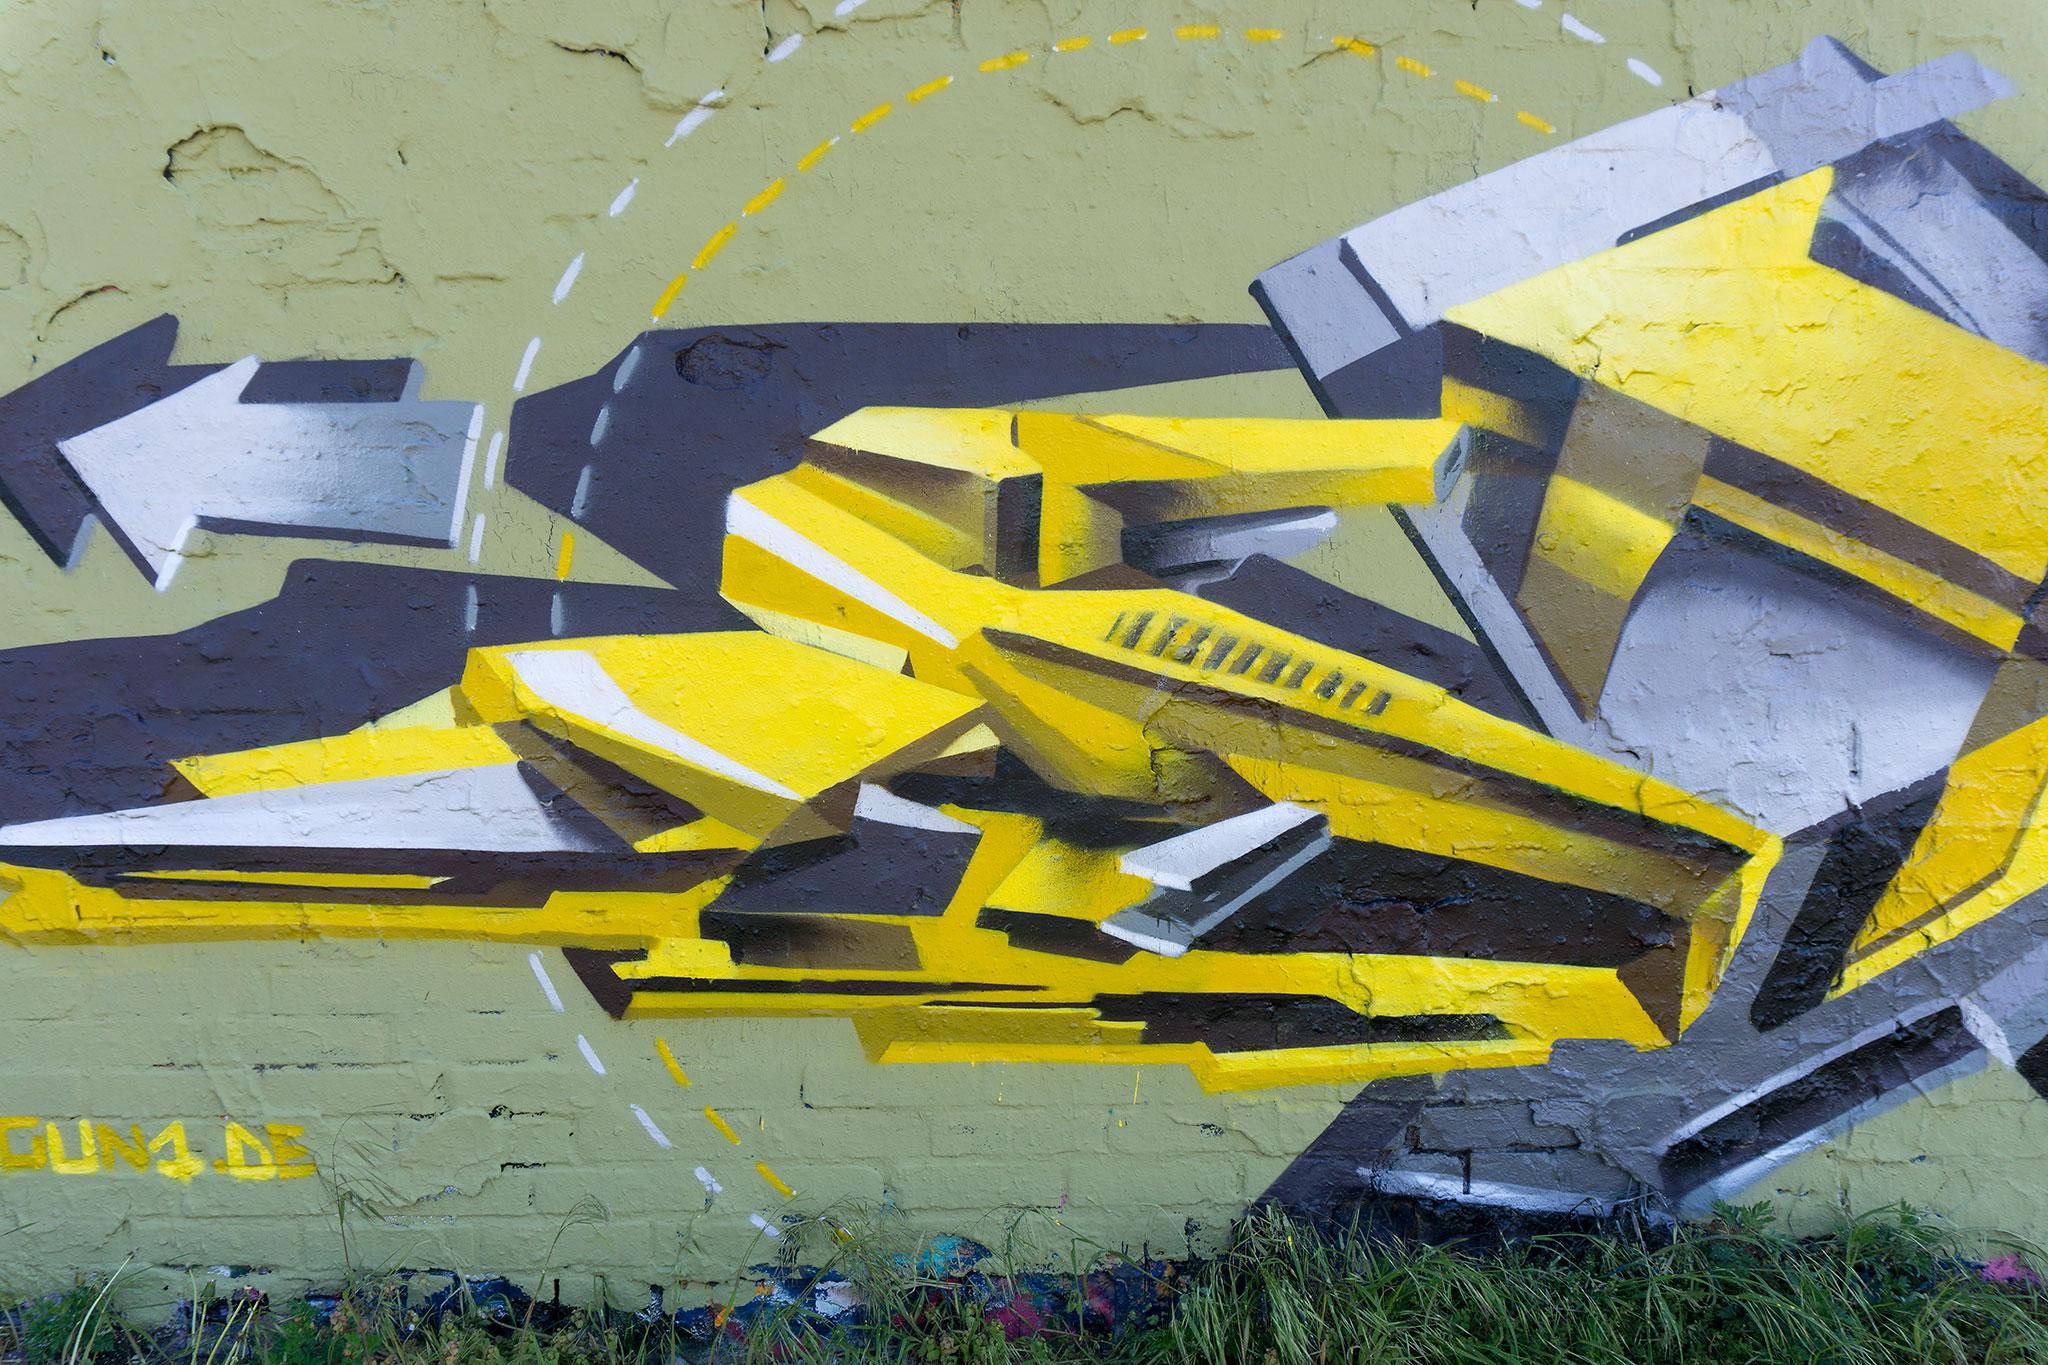 shogun_one_graffiti_luebeck_2016_5